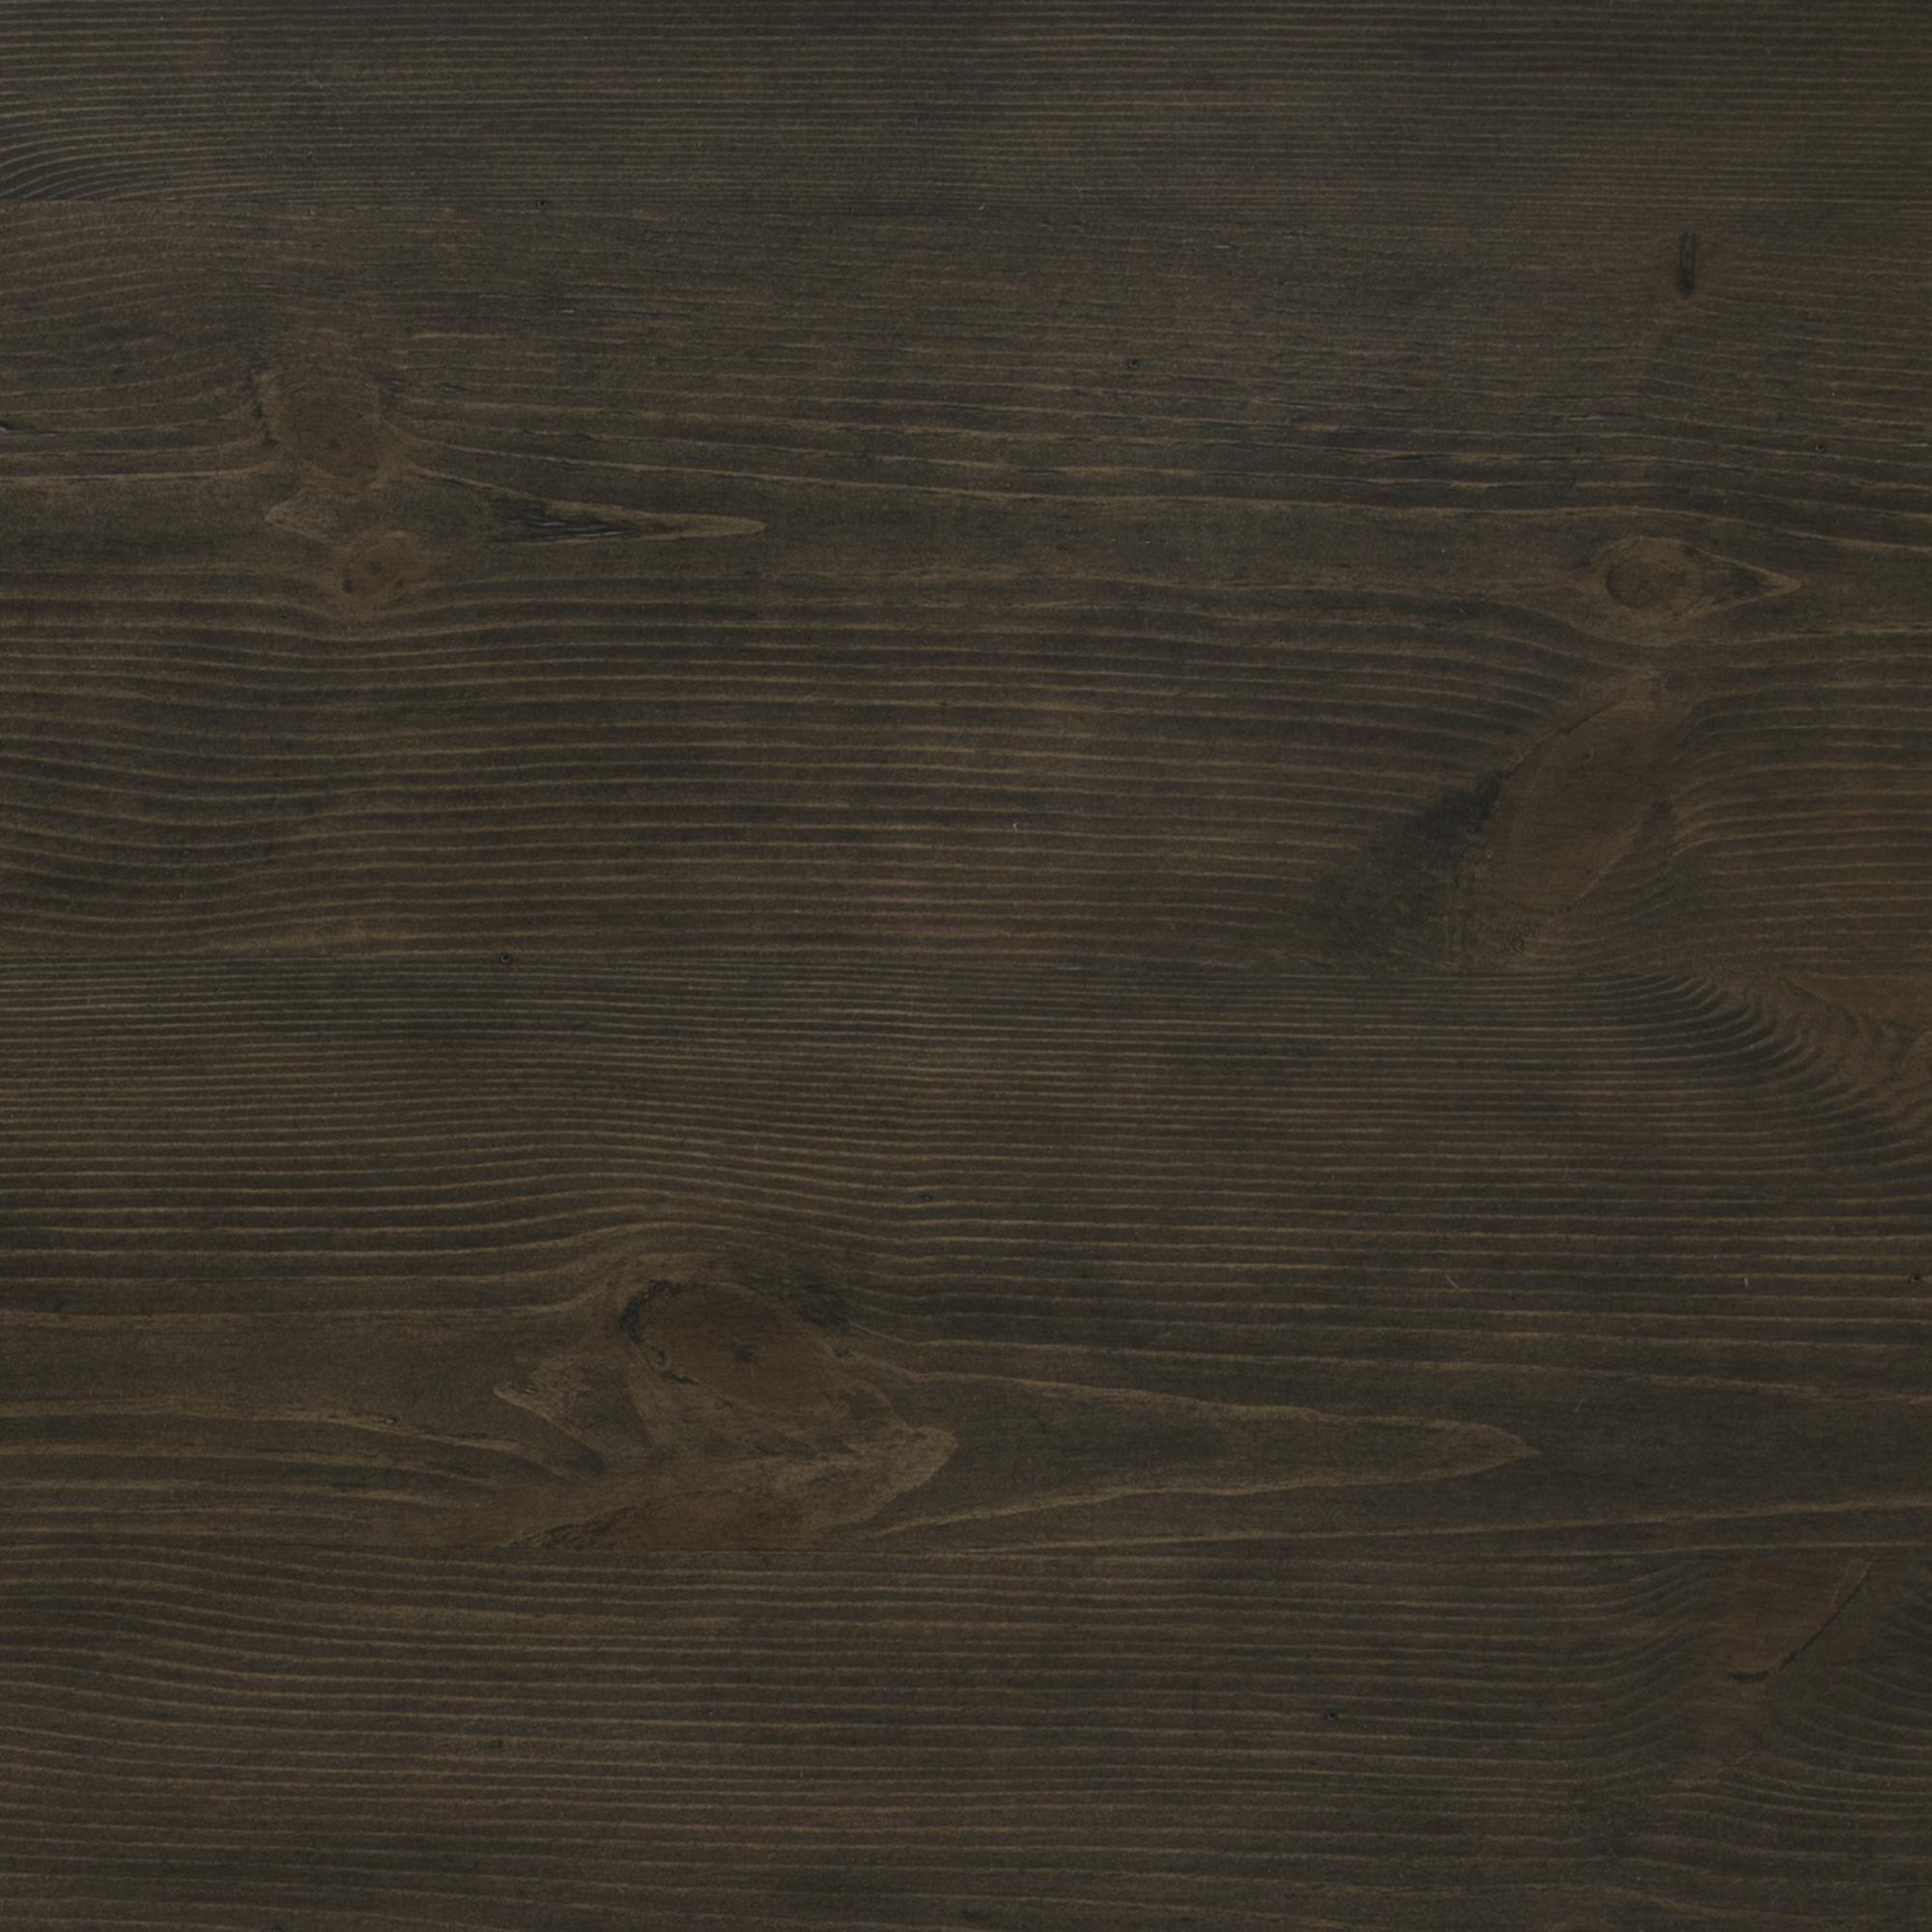 Wood Swatch :: Waxy Weathered Pine